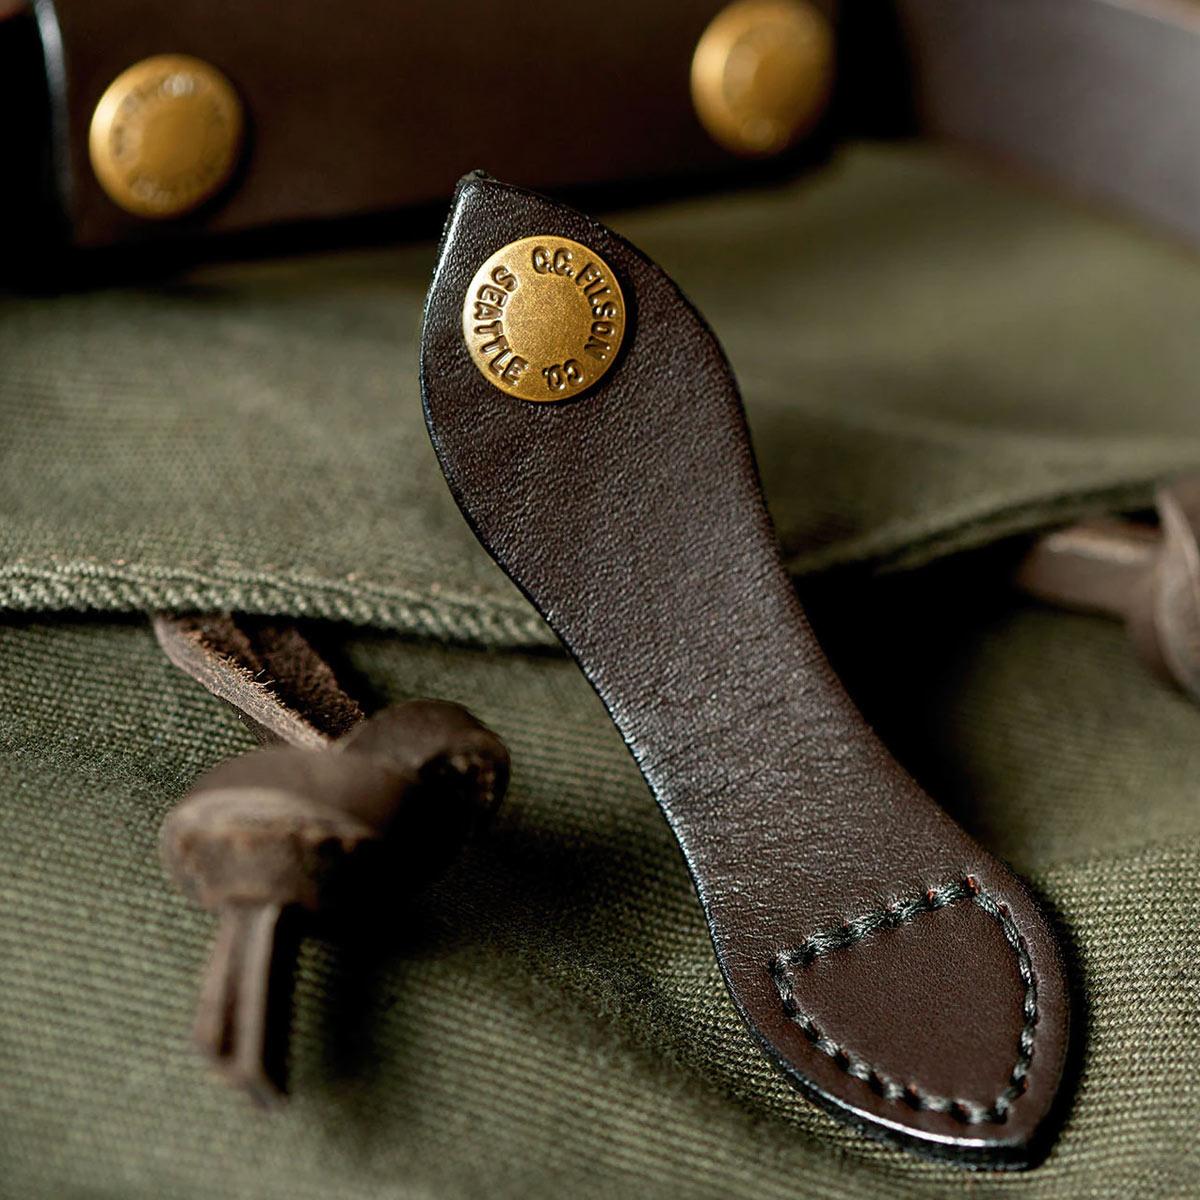 Filson Duffle Small Otter Green, vakmanschap tot in perfectie